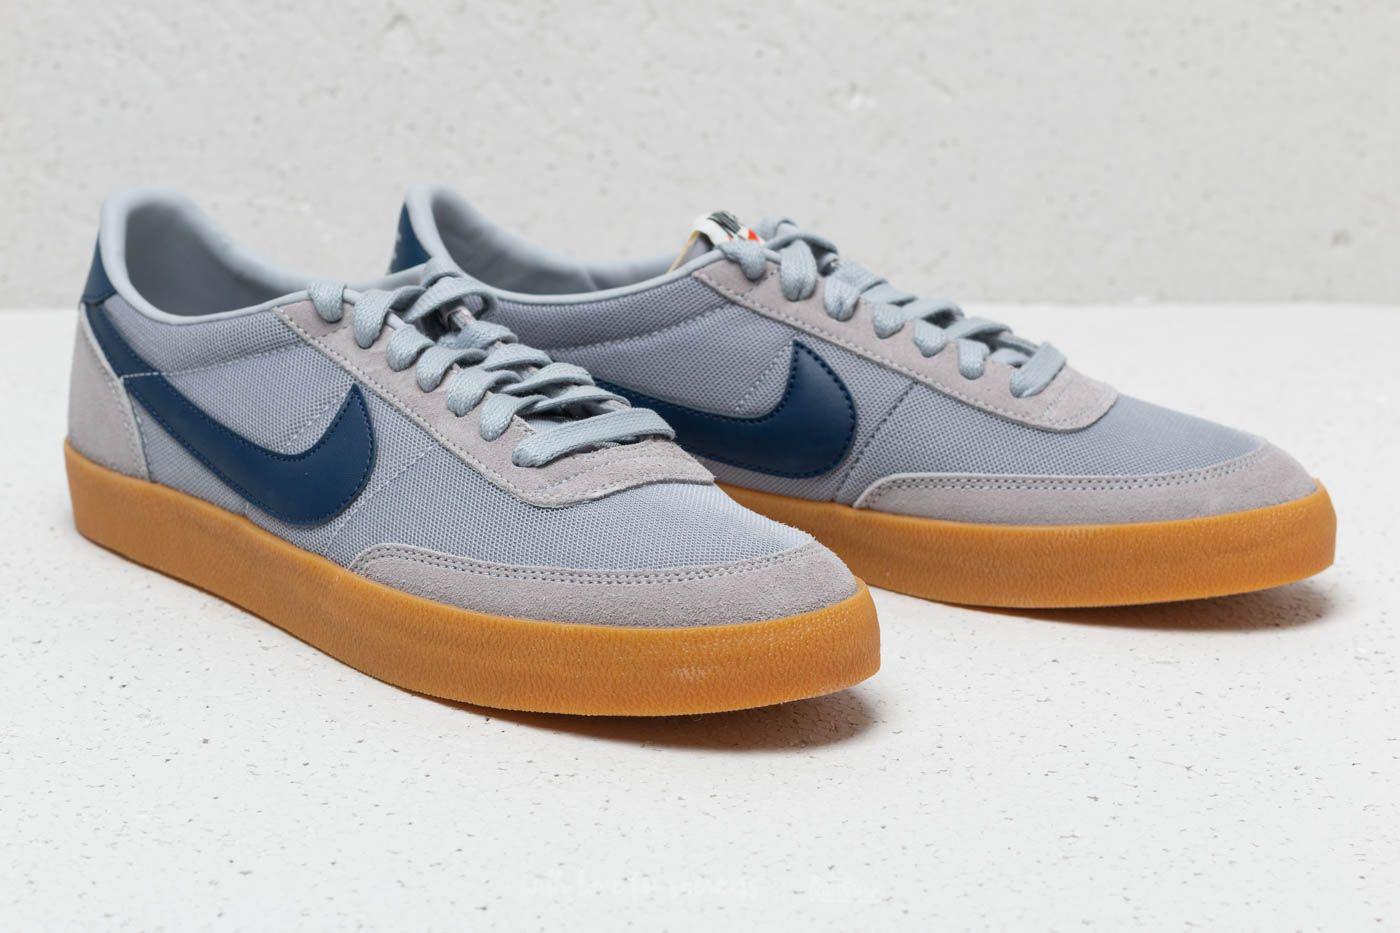 Lyst - Nike Killshot Vulc Wolf Grey  Navy-gum Yellow in Blue for Men b78448db4